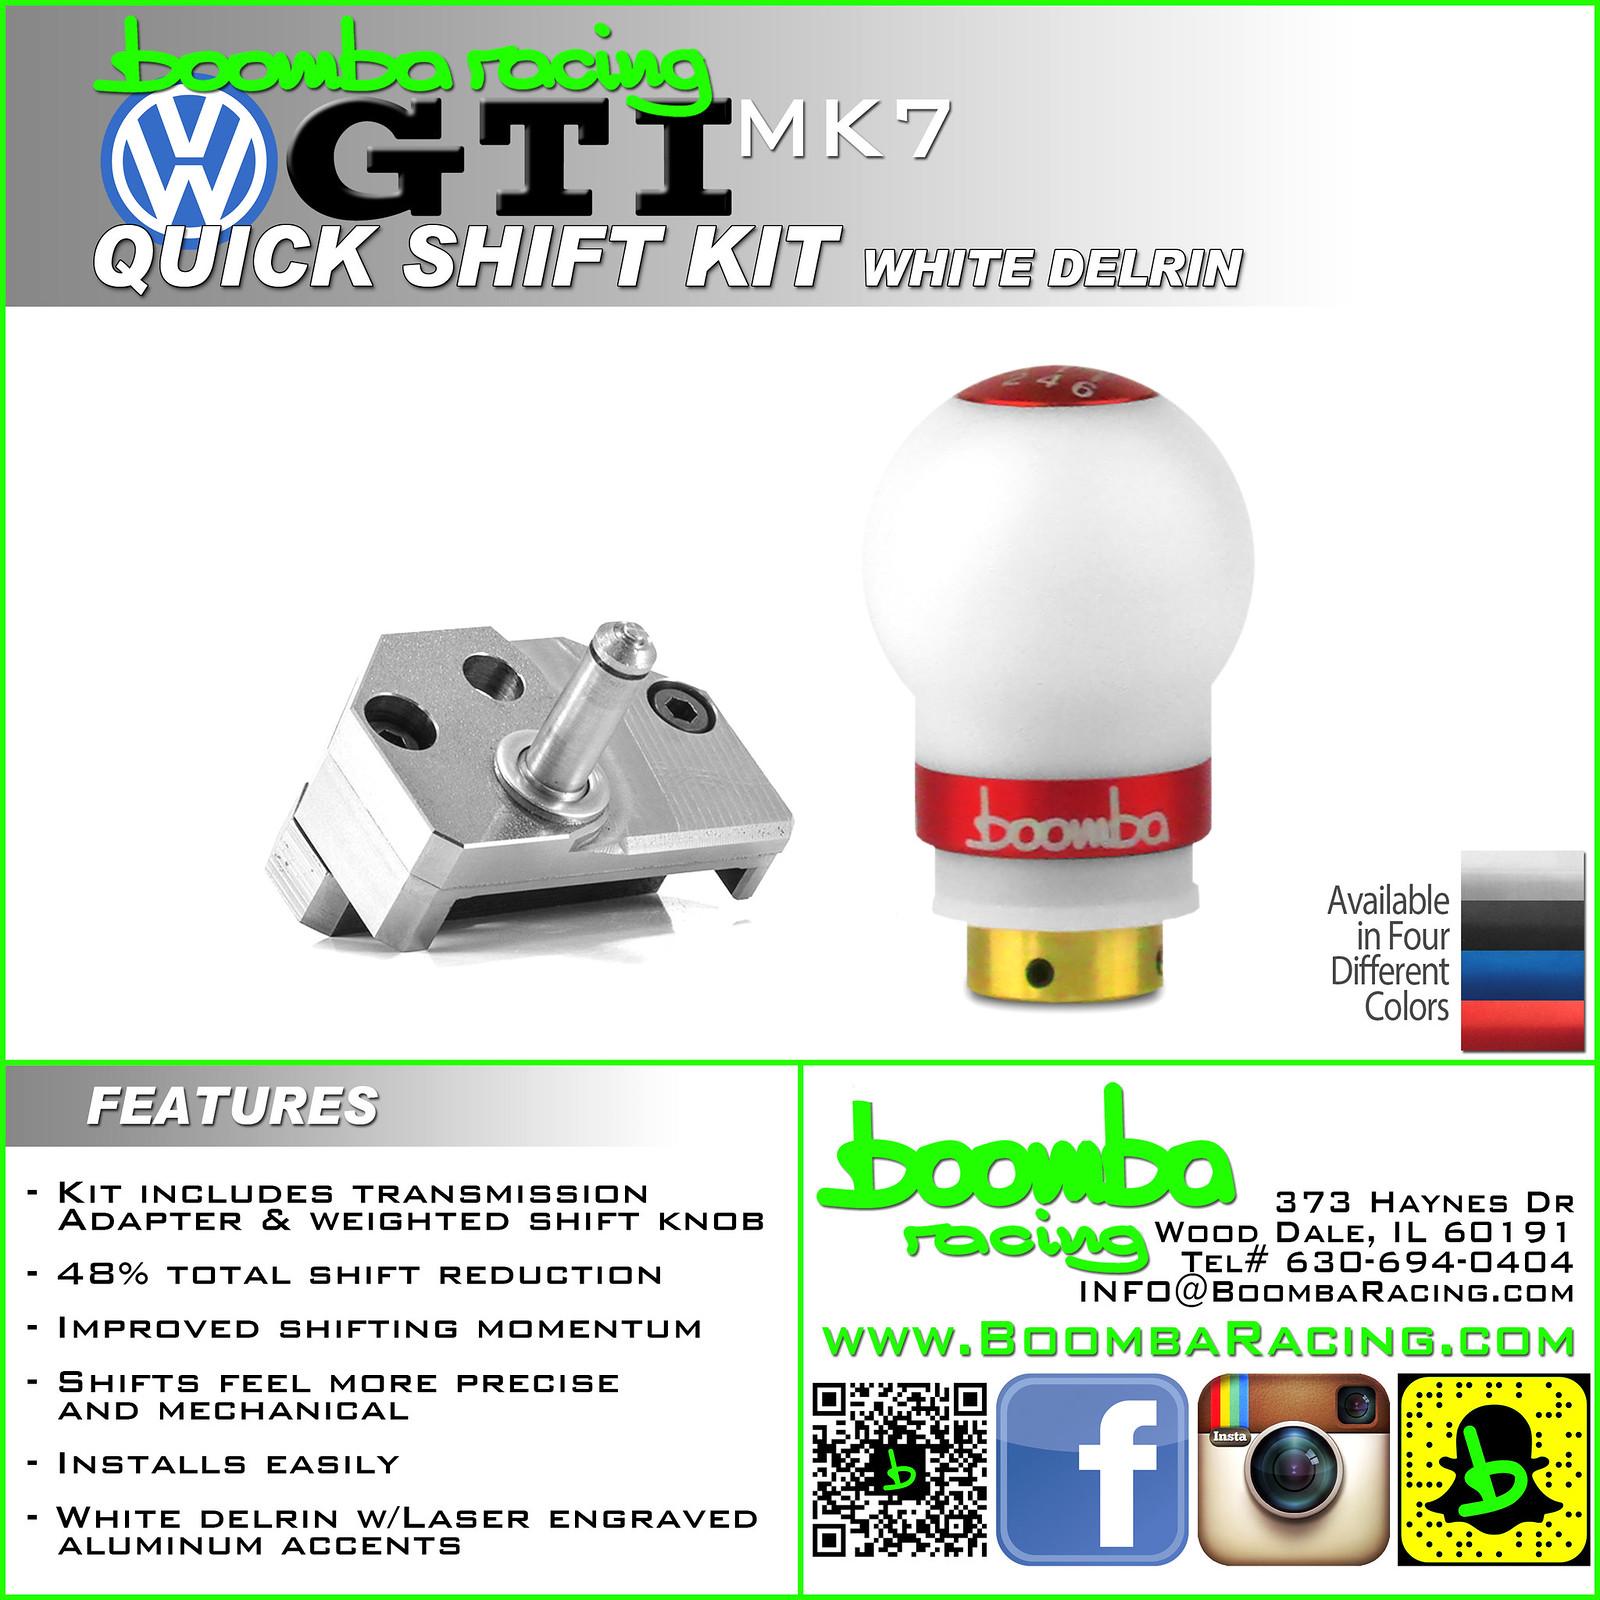 NEW Quick Shift Kit - Boomba Racing - GOLFMK7 - VW GTI MKVII